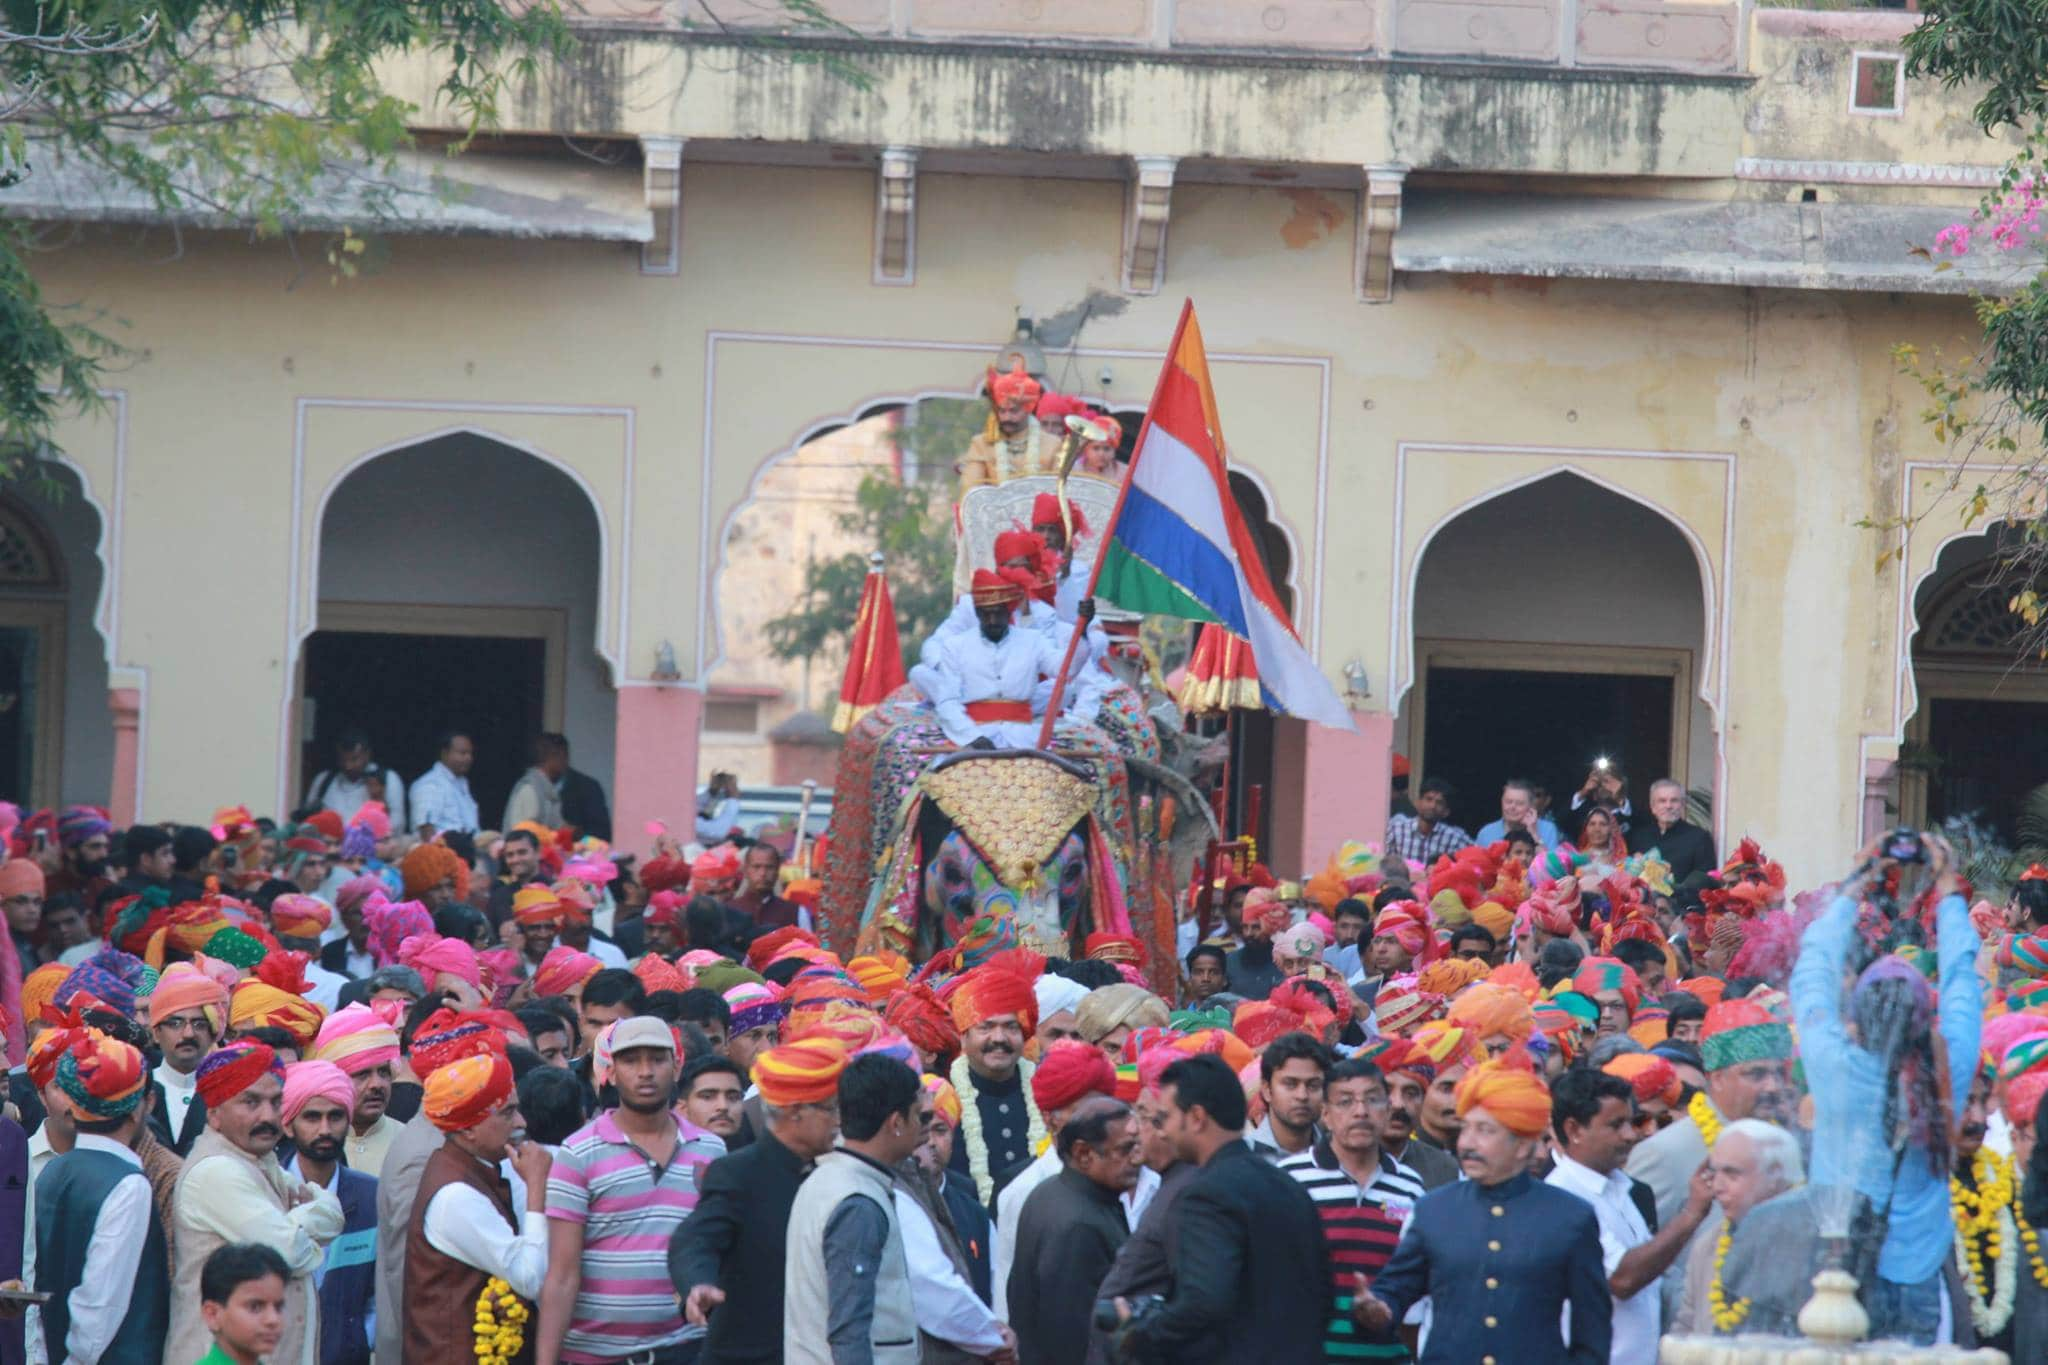 The wedding party entering Narain Niwas Palace